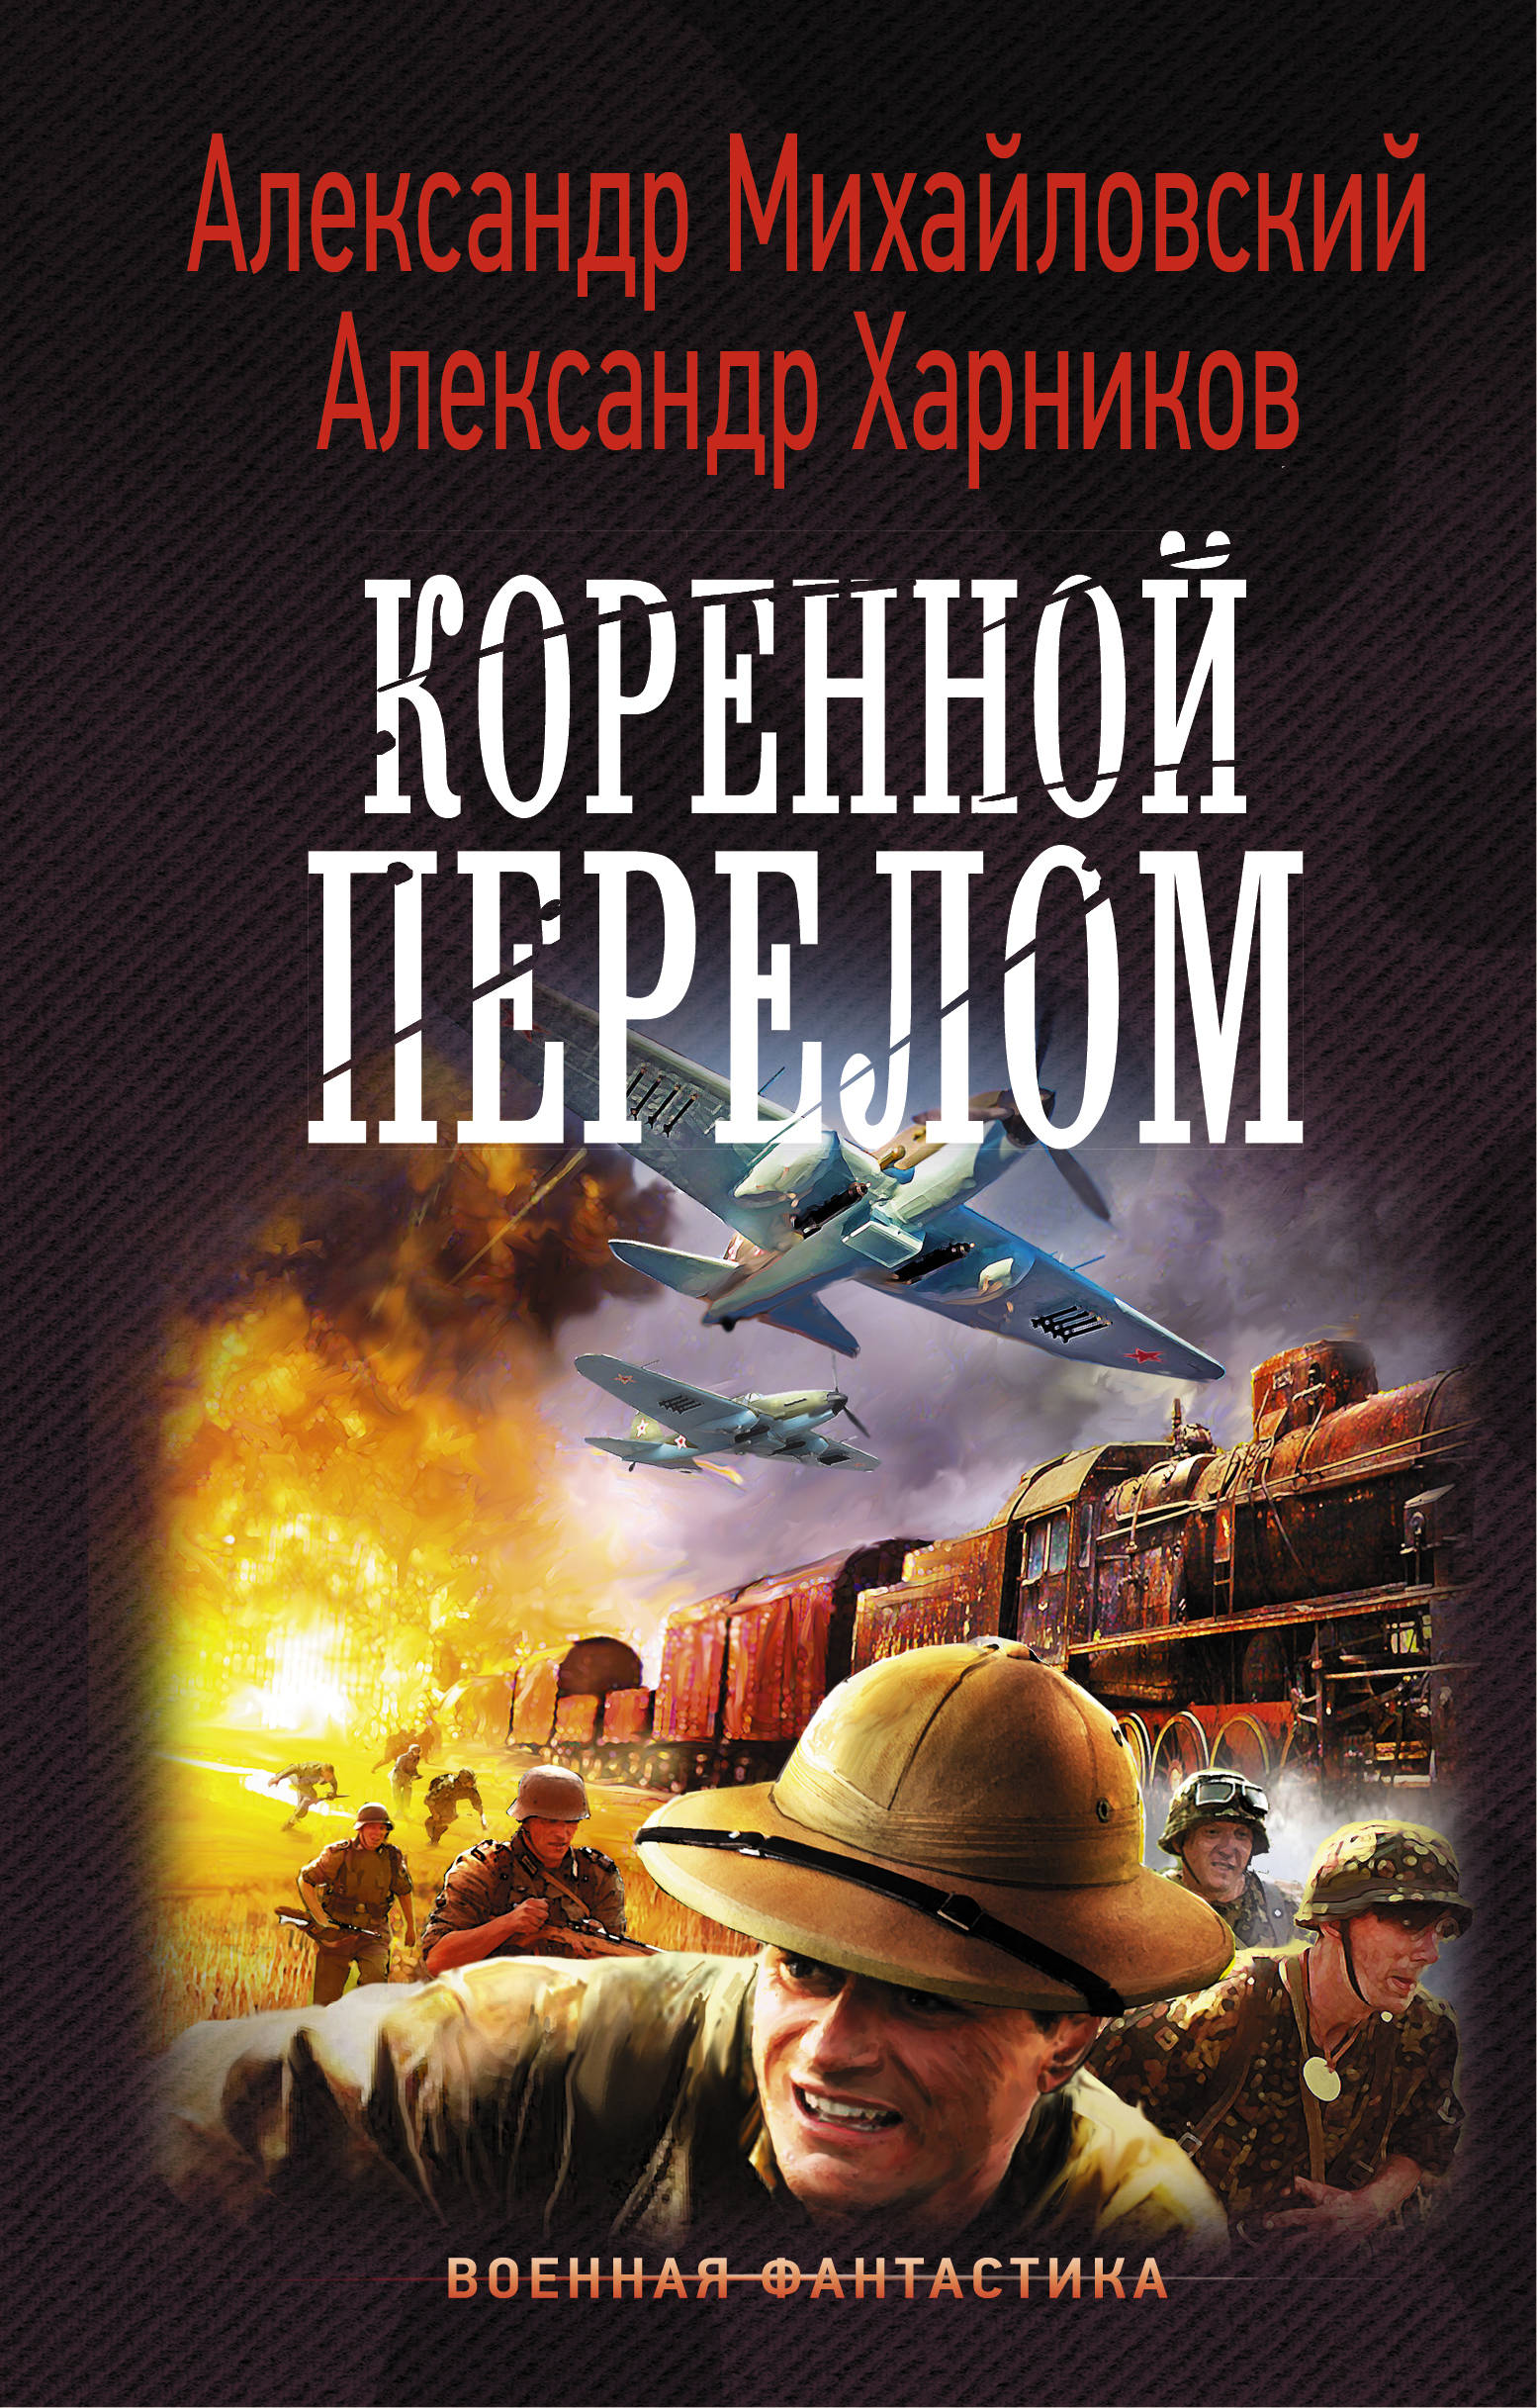 Александр Михайловский, Александр Харников «Коренной перелом»